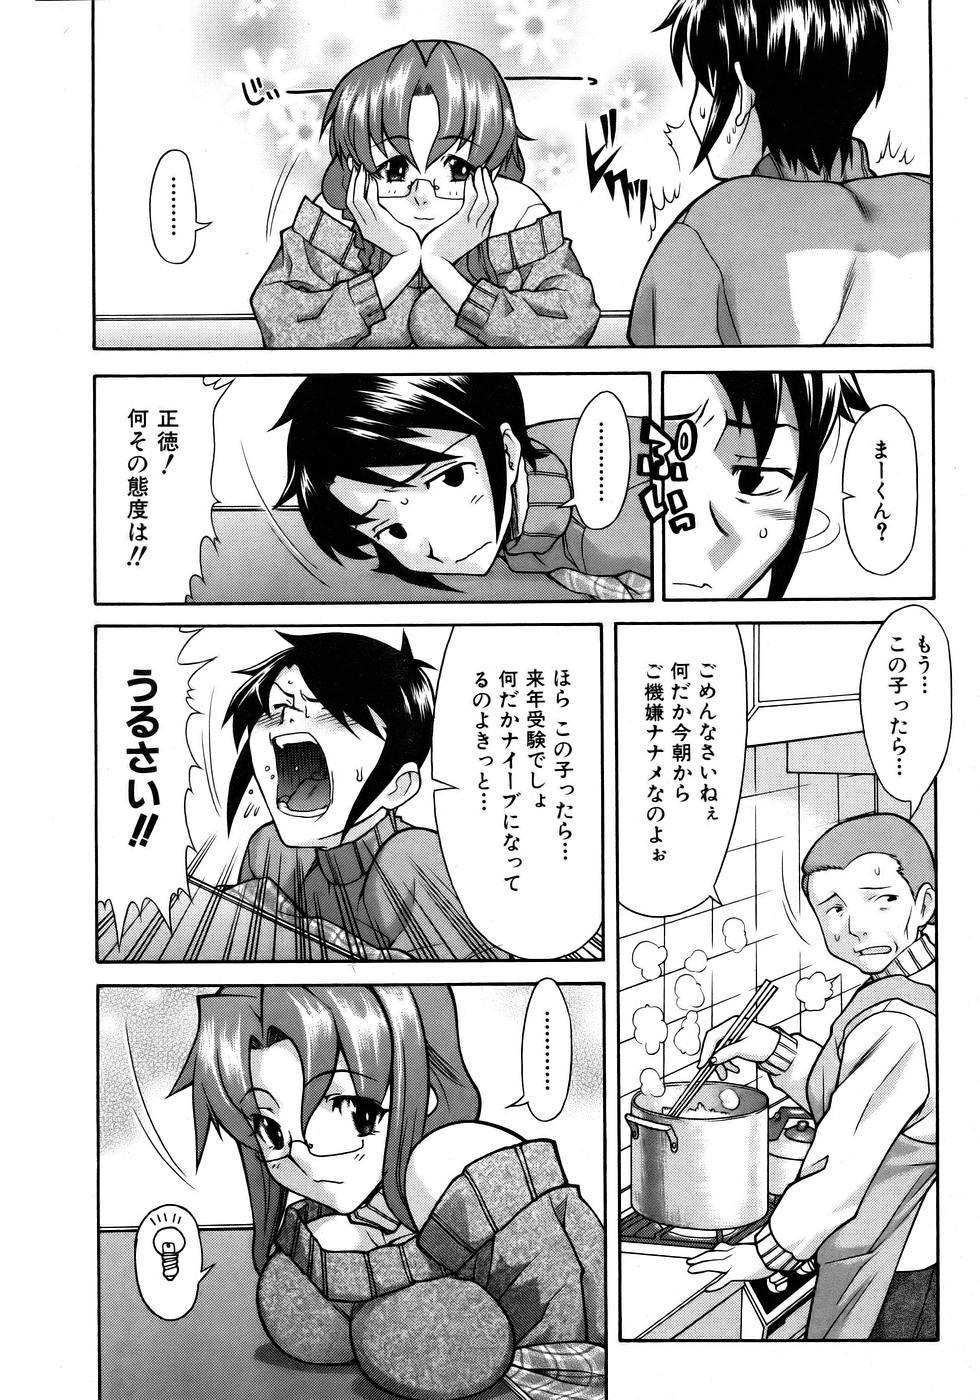 COMIC AUN 2005-12 Vol. 115 85